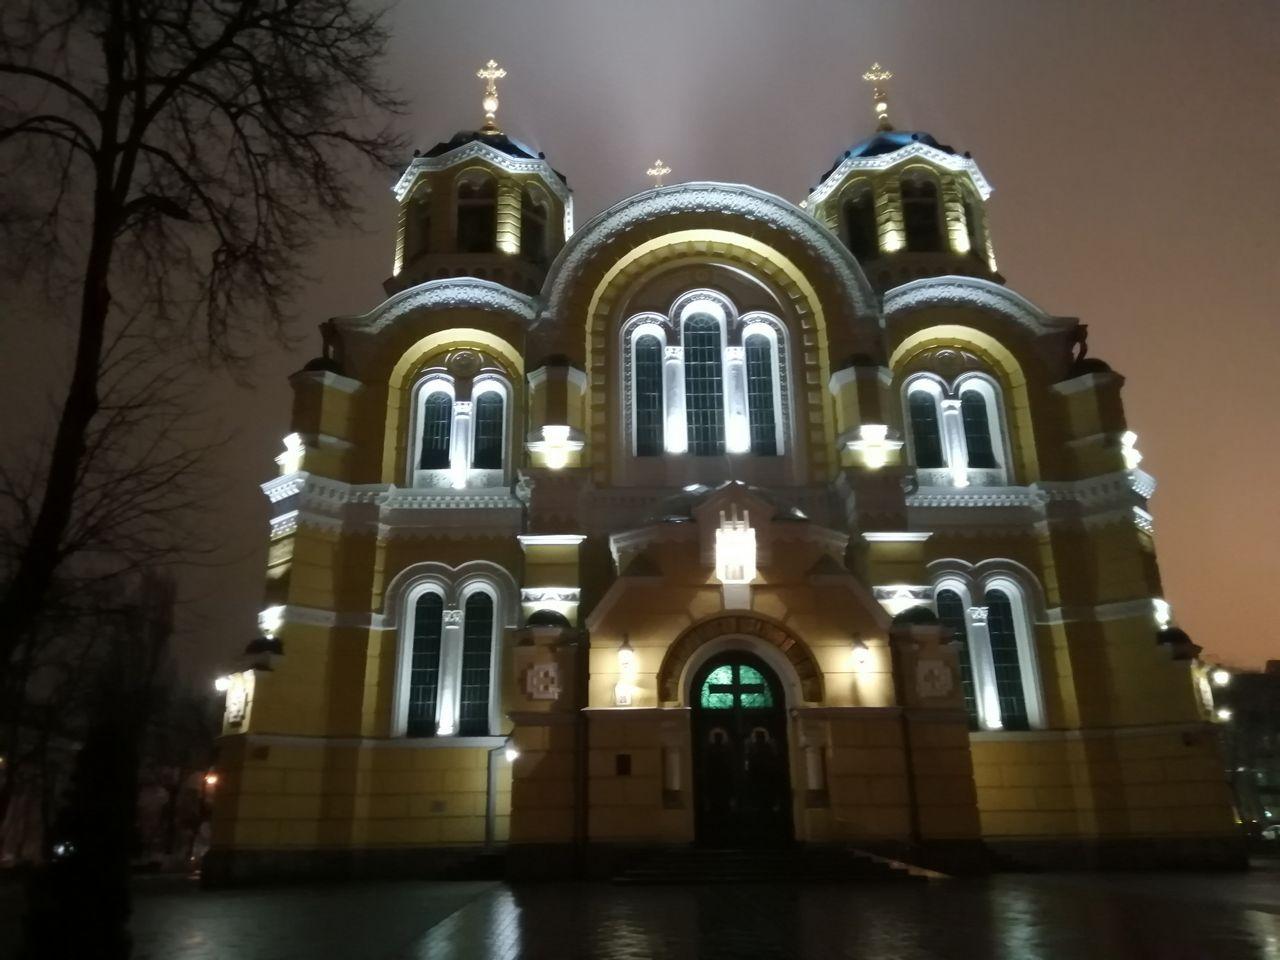 Catedral de San Volodýmyr o Vladimir iluminada por la noche.